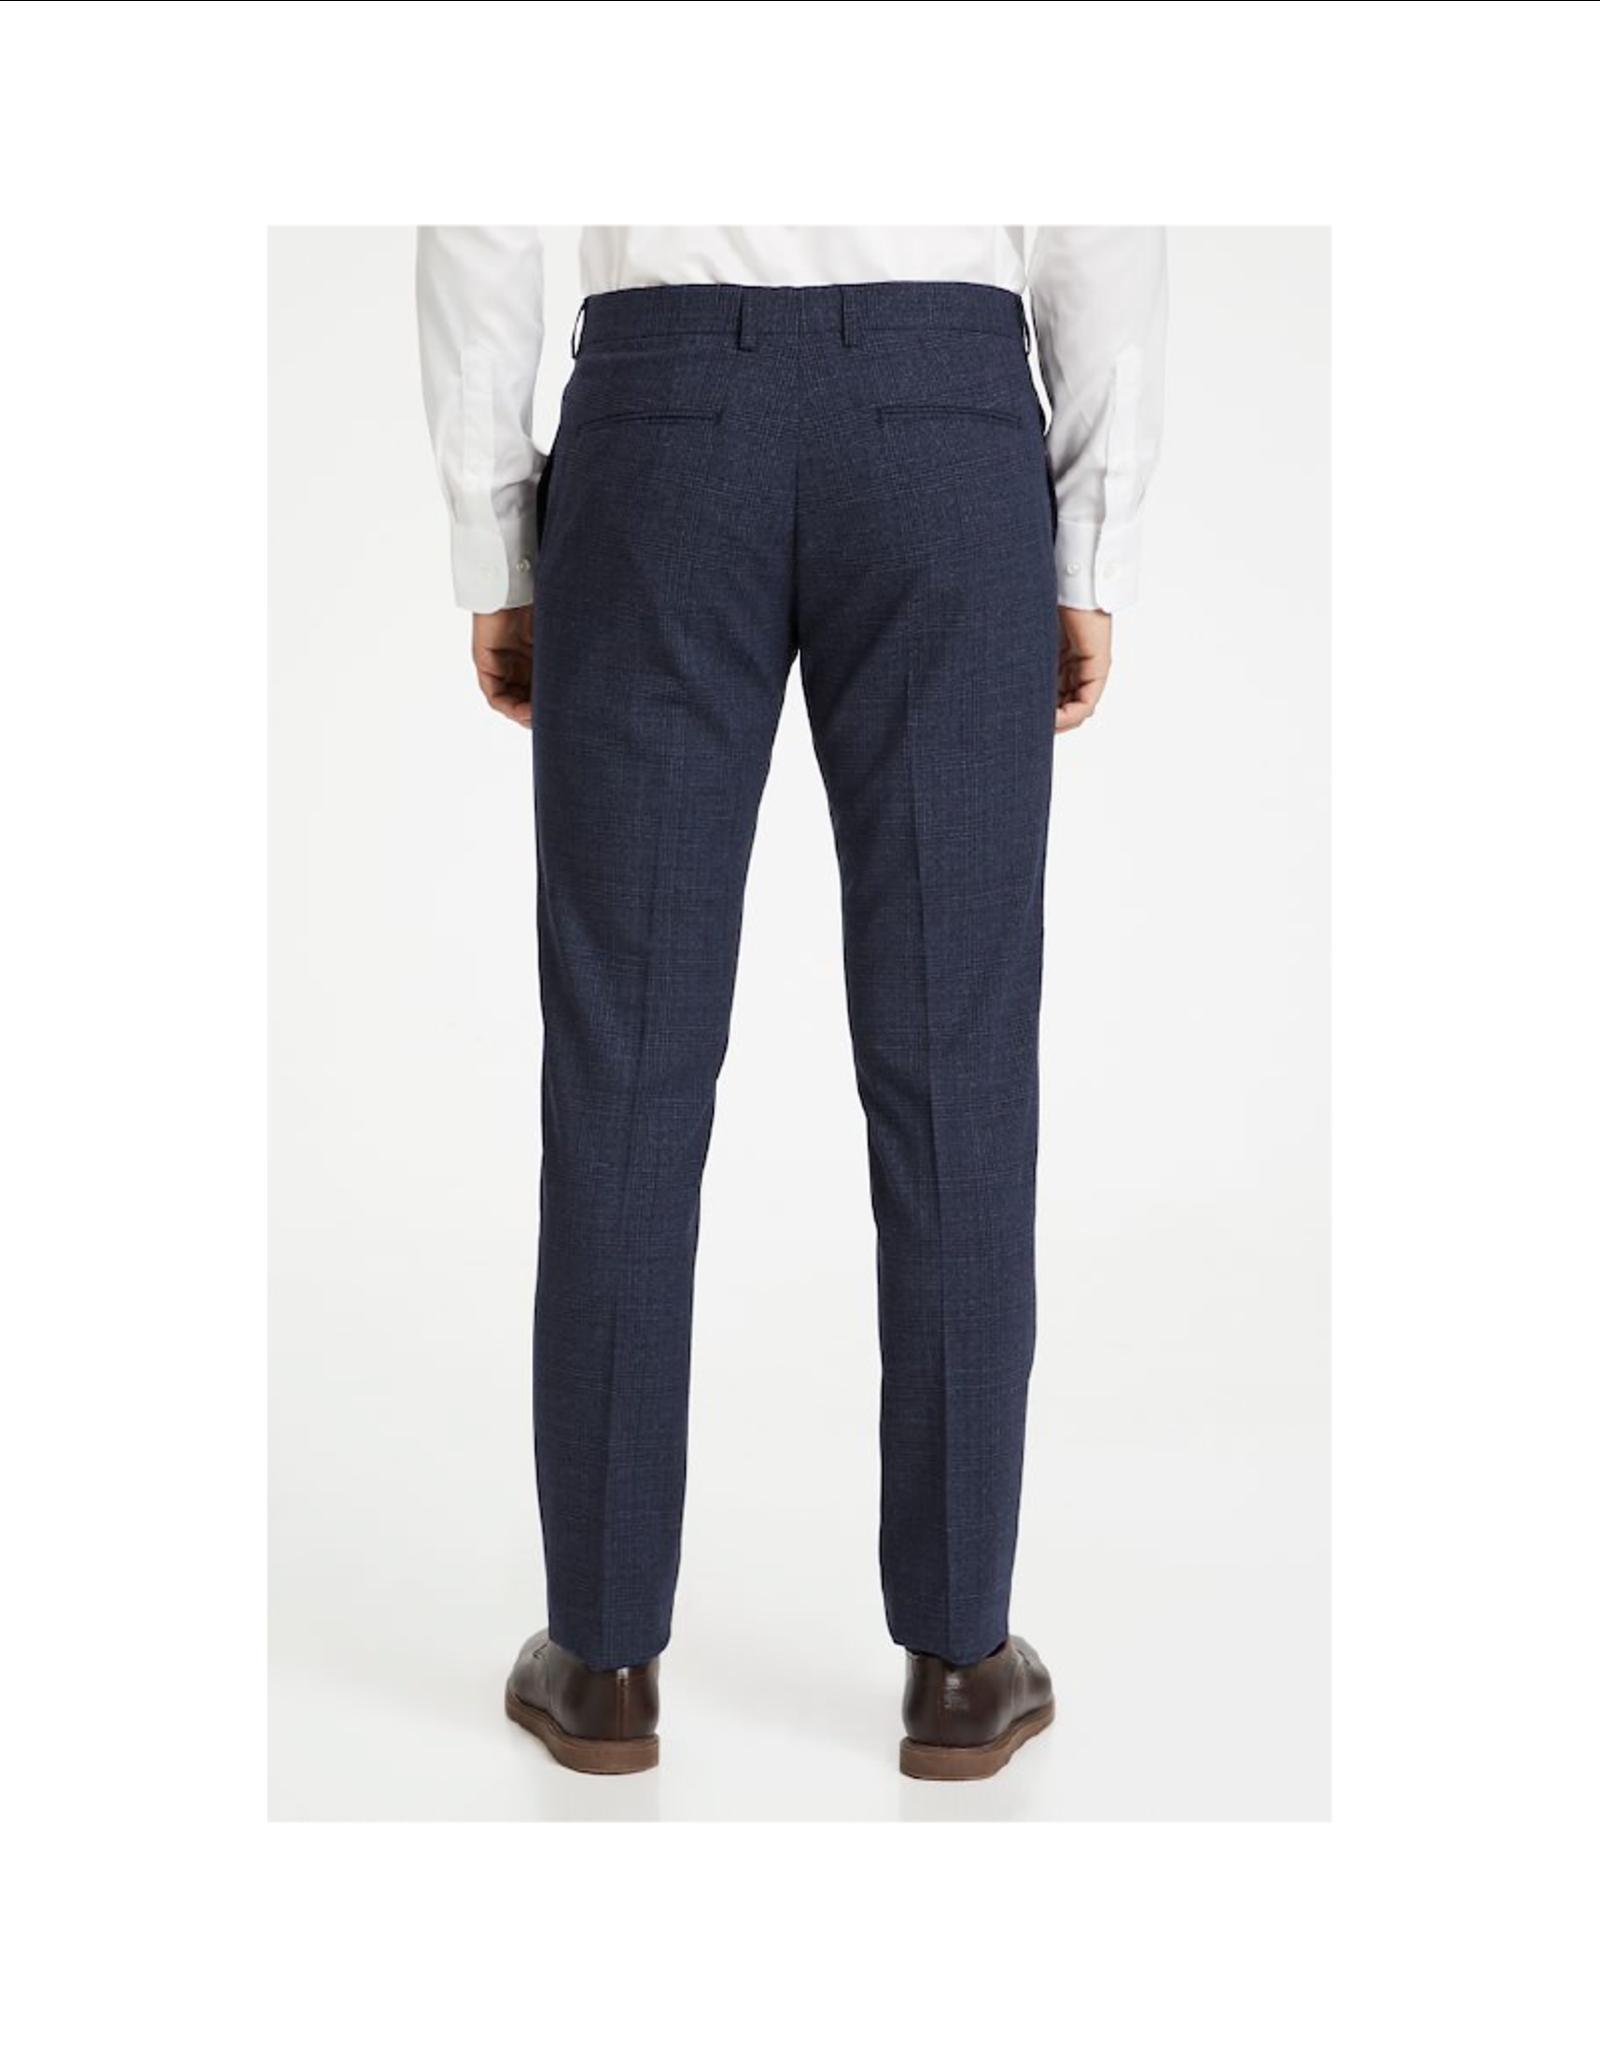 Matinique Las 4-Way Stretch Wool Suit Pant